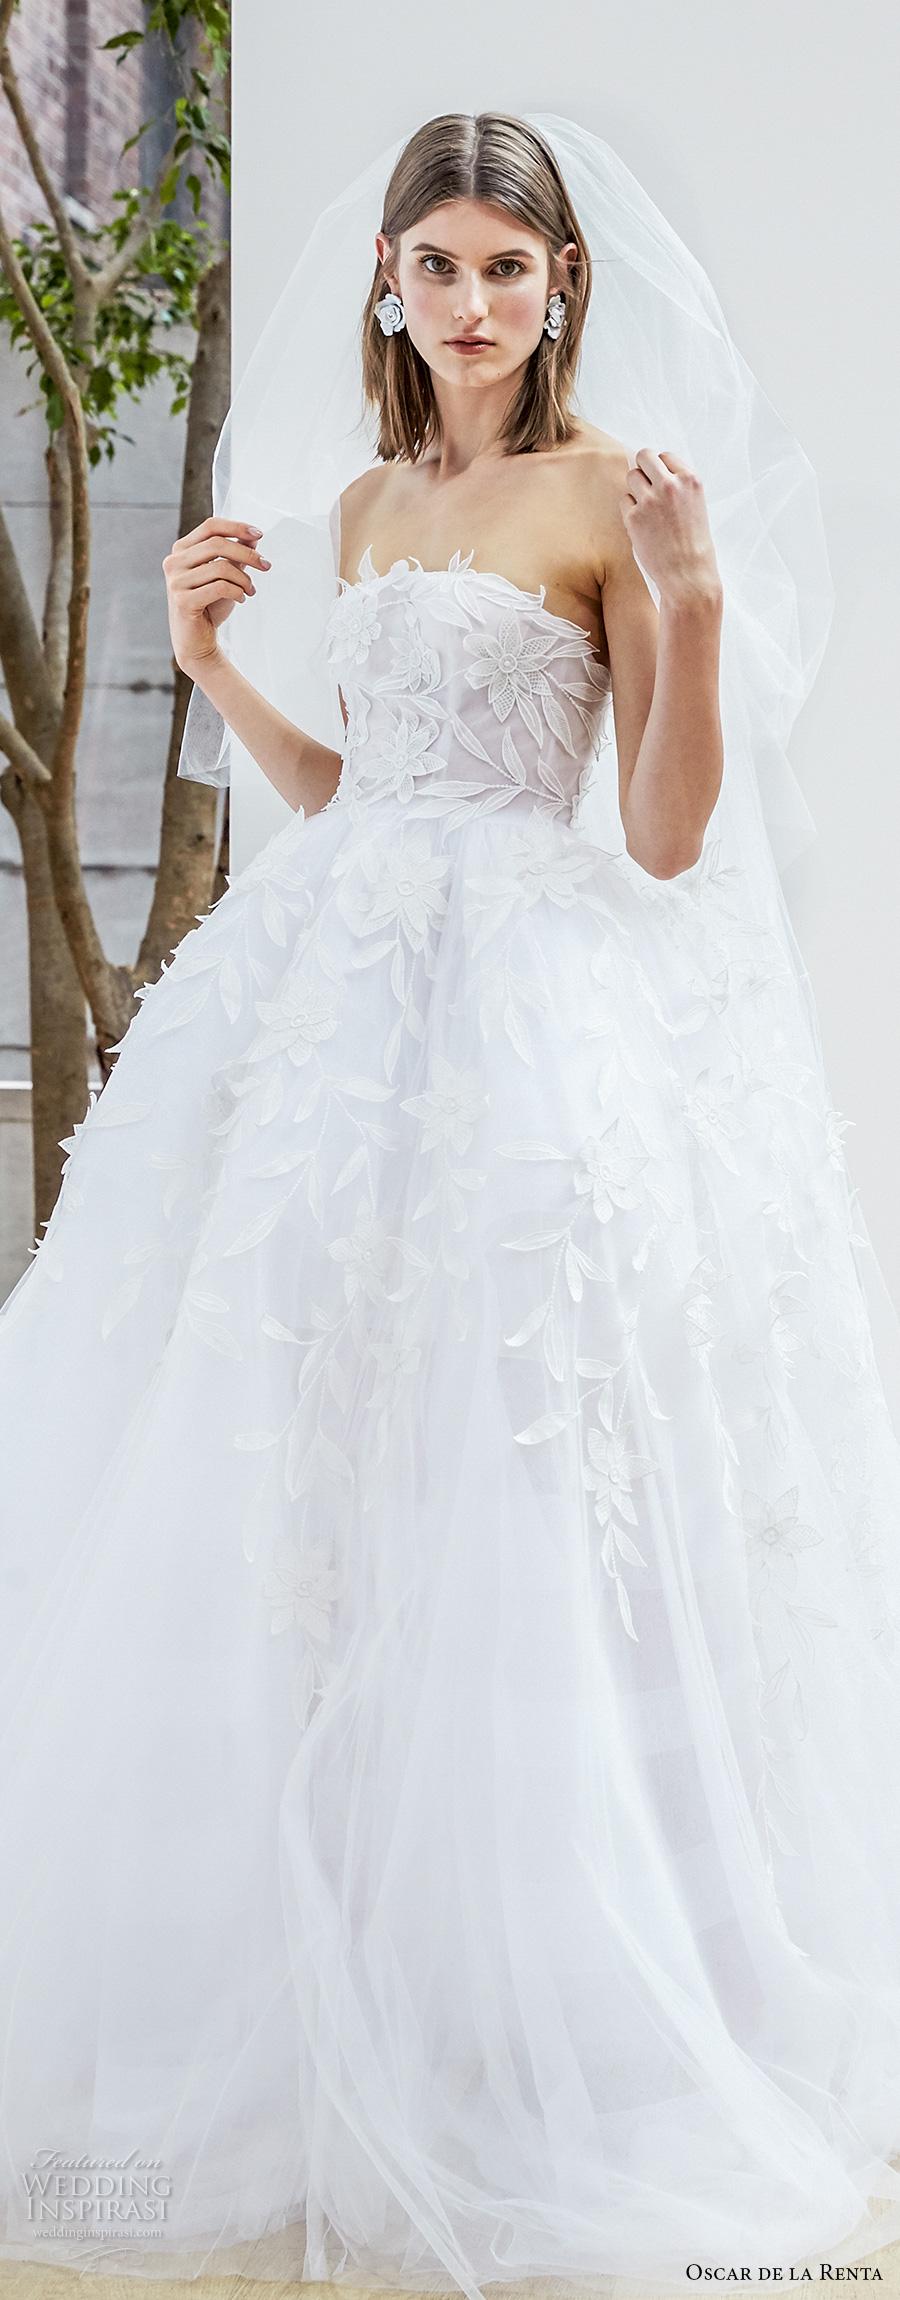 d06f6c6bc1f oscar de la renta spring 2018 bridal strapless straight across neckline  heavily embellished bodice romantic princess